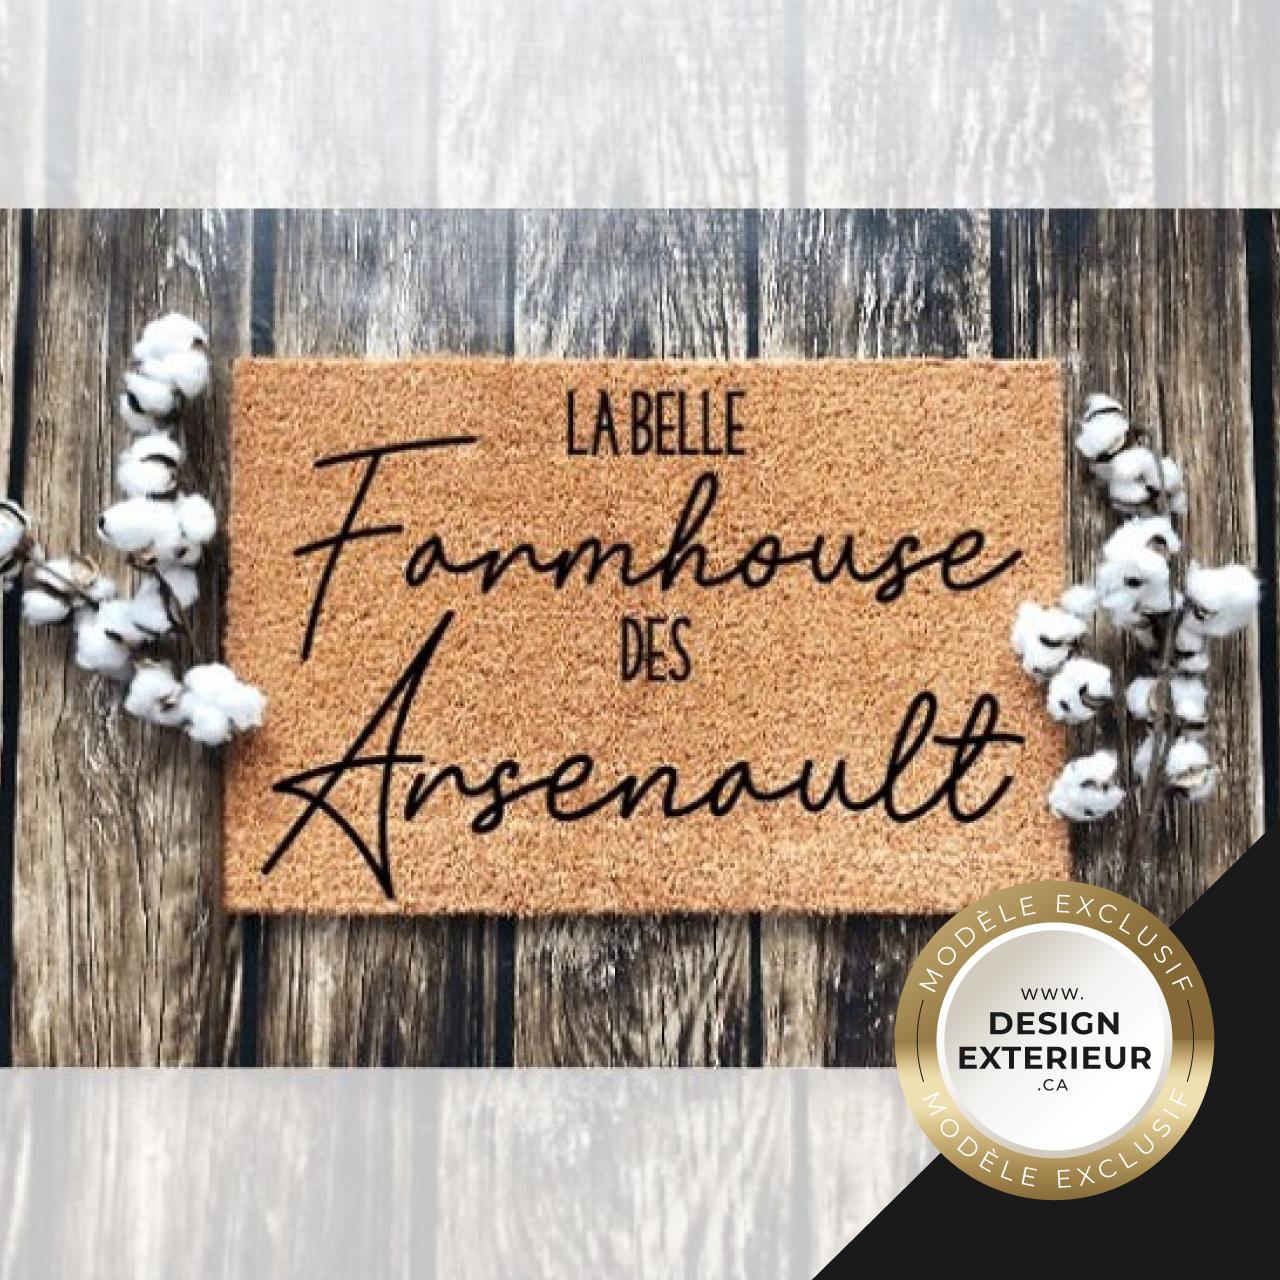 Paillasson Farmhouse personnalise Arsenault Design exterieur badge Exclusif